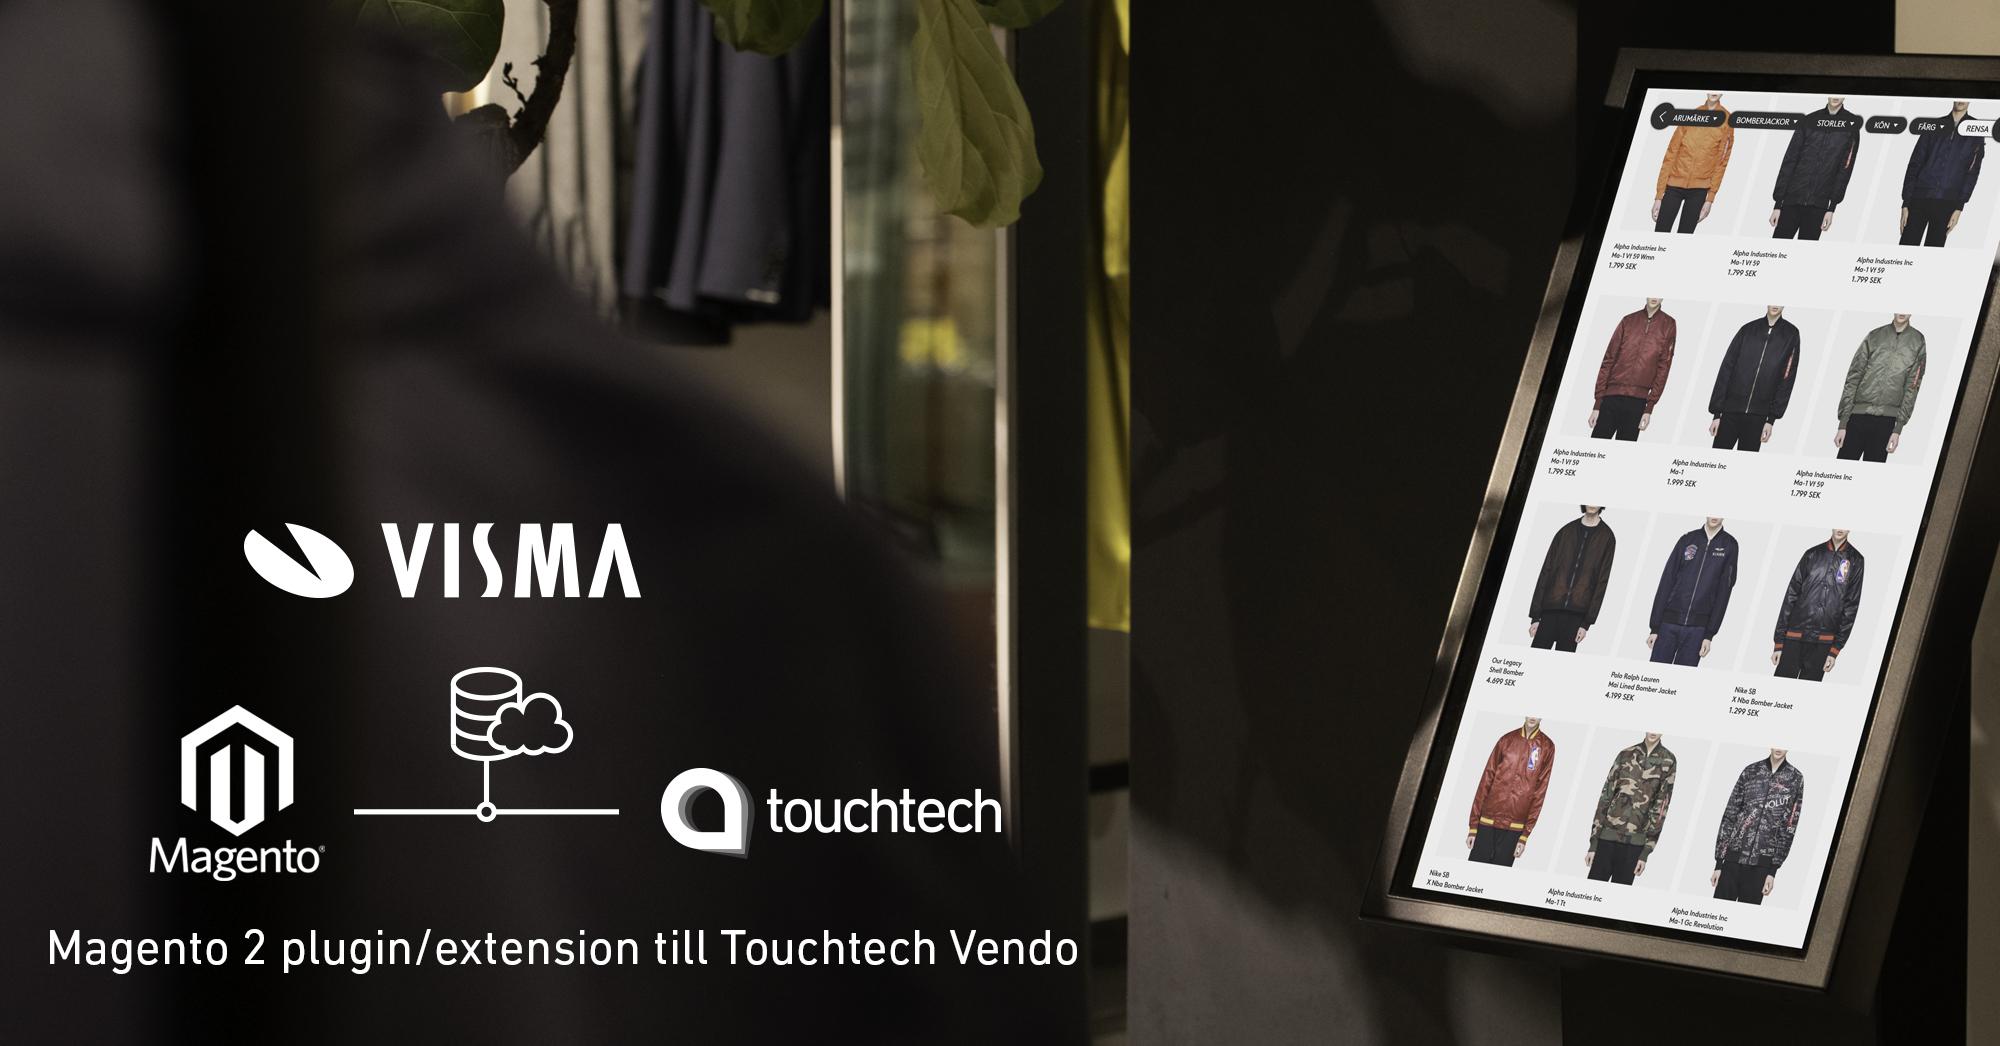 TouchtechVisma.jpg